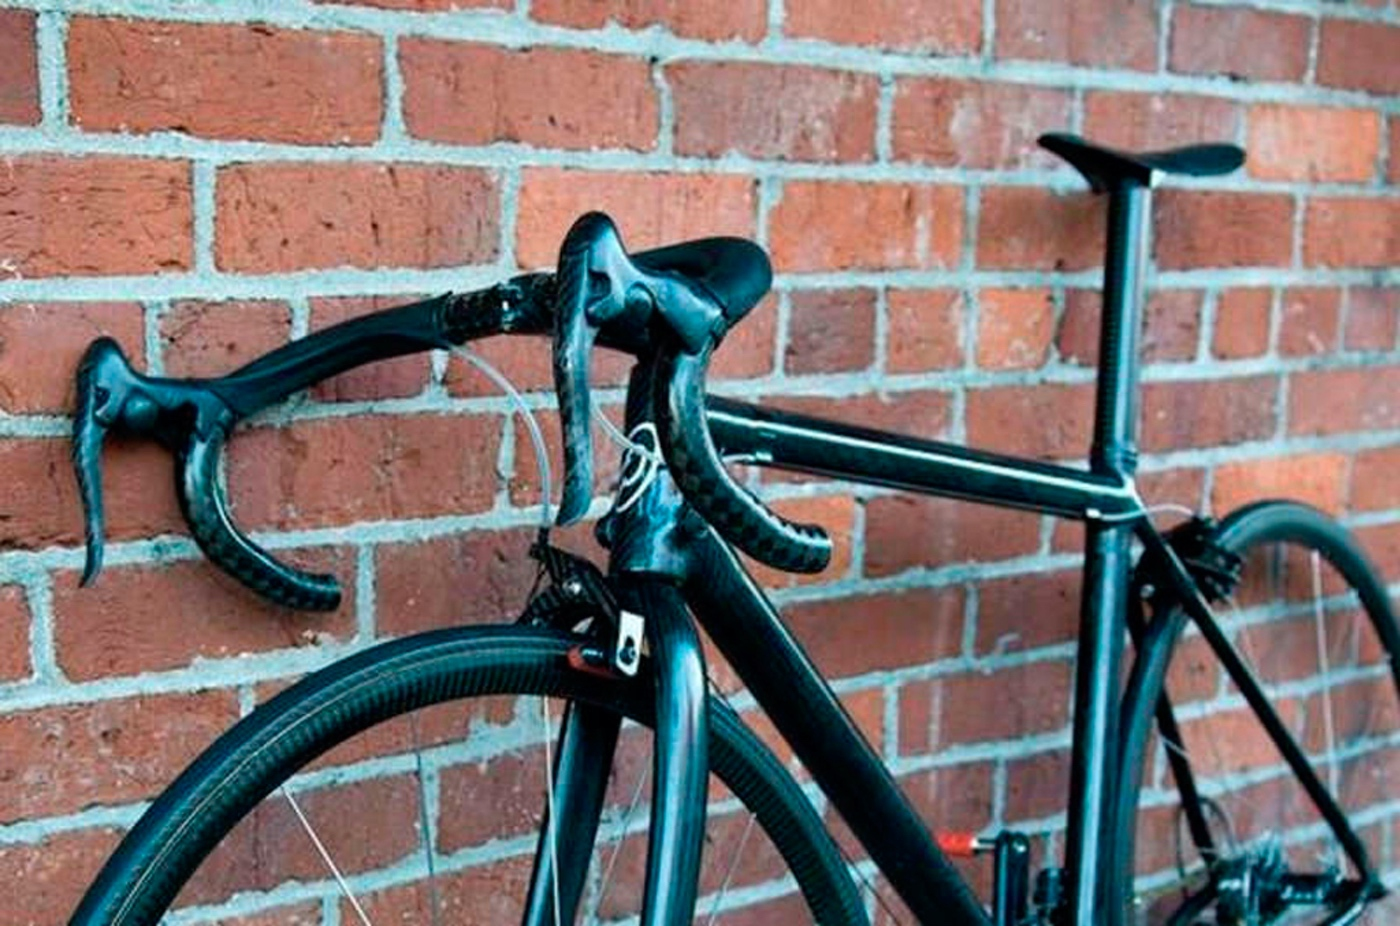 La bicicleta de carretera más ligera del mundo